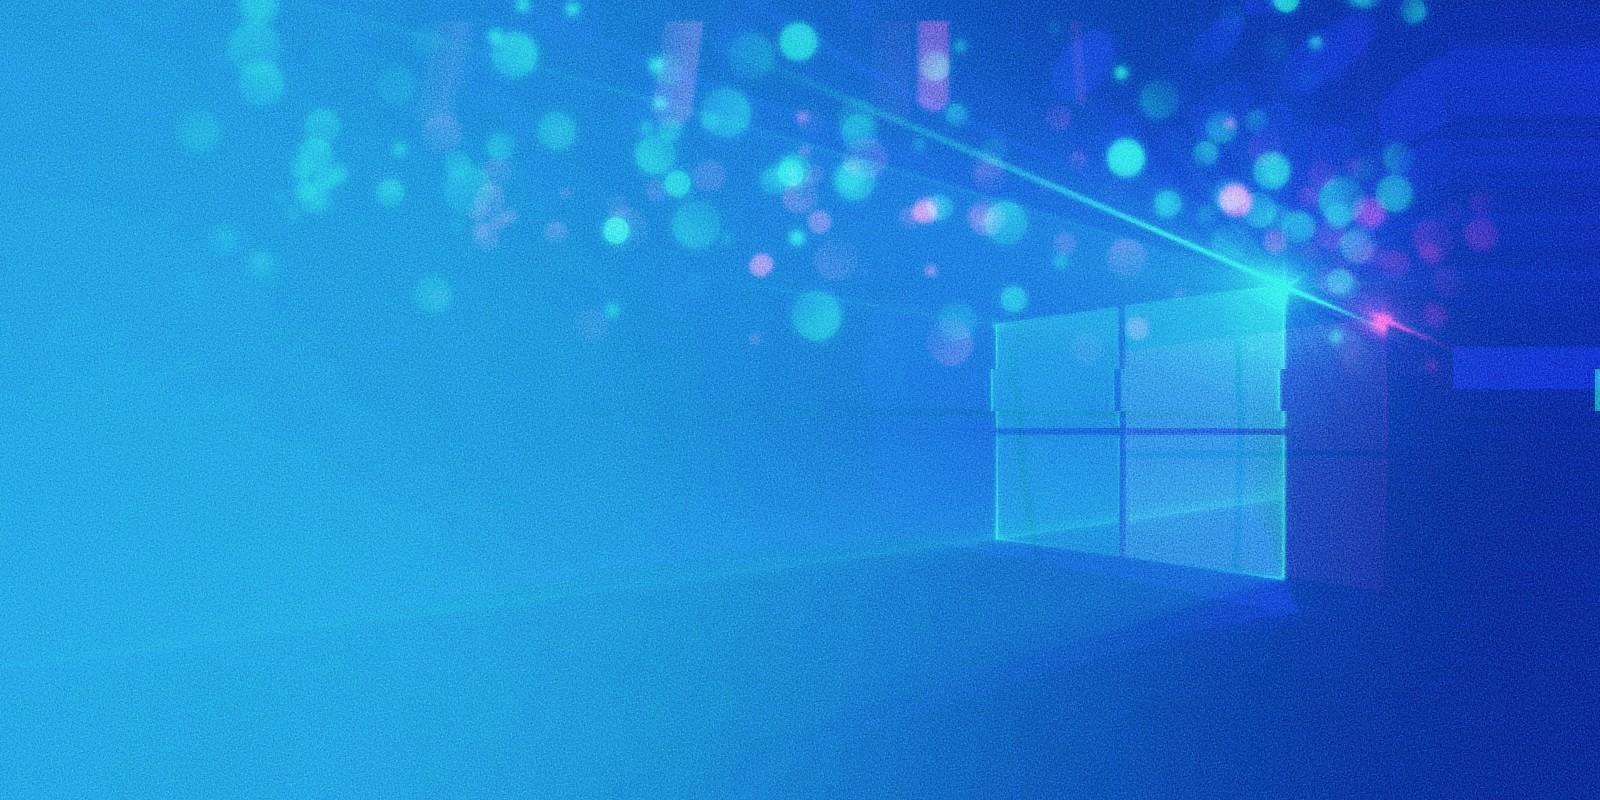 Windows Update可能被滥用来执行恶意文件